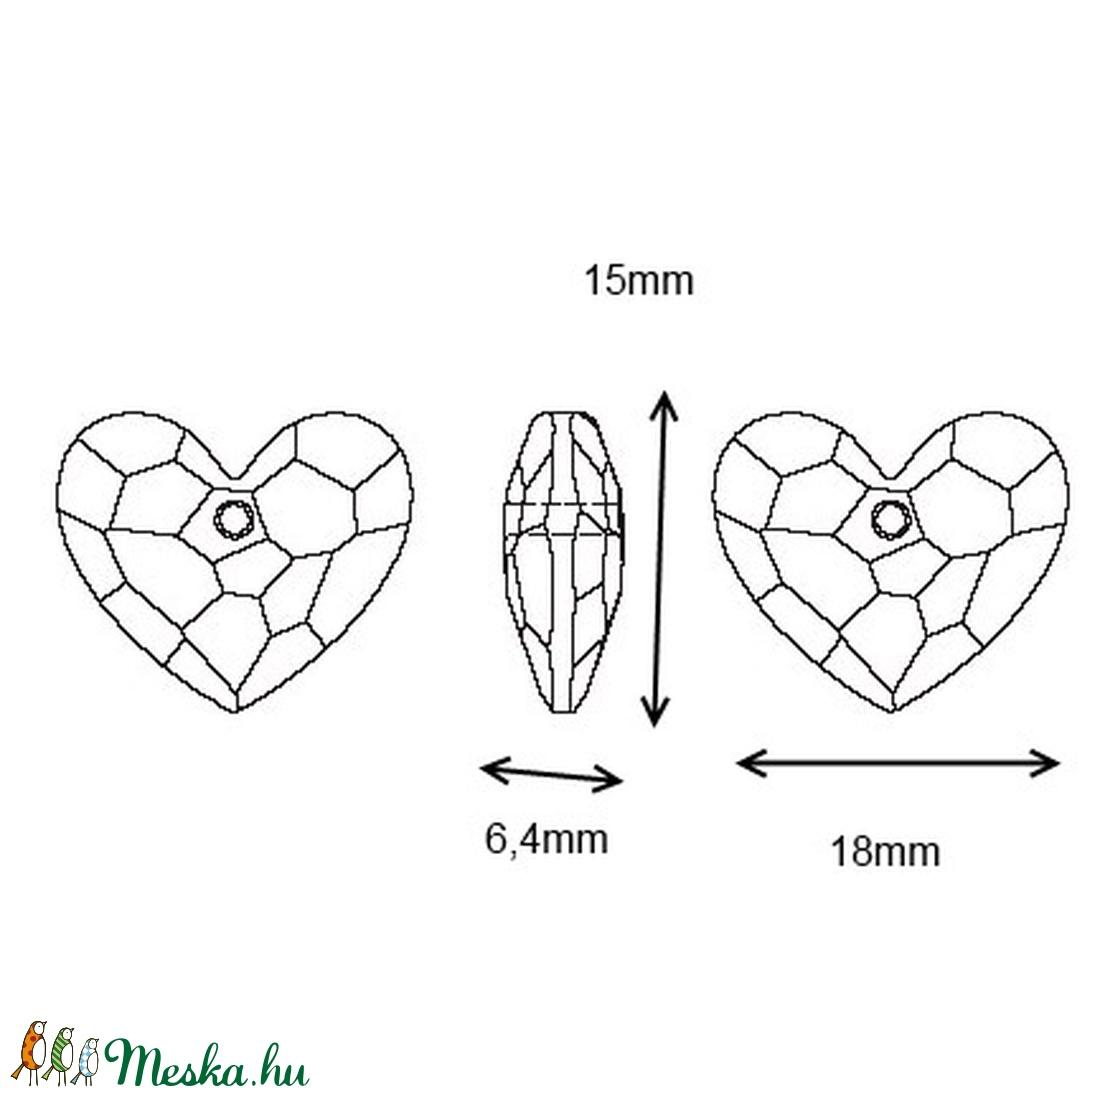 Swarovski Truly in Love szív18mm-es medál  SW6263-18 - gyöngy, ékszerkellék - swarovski kristályok - Meska.hu